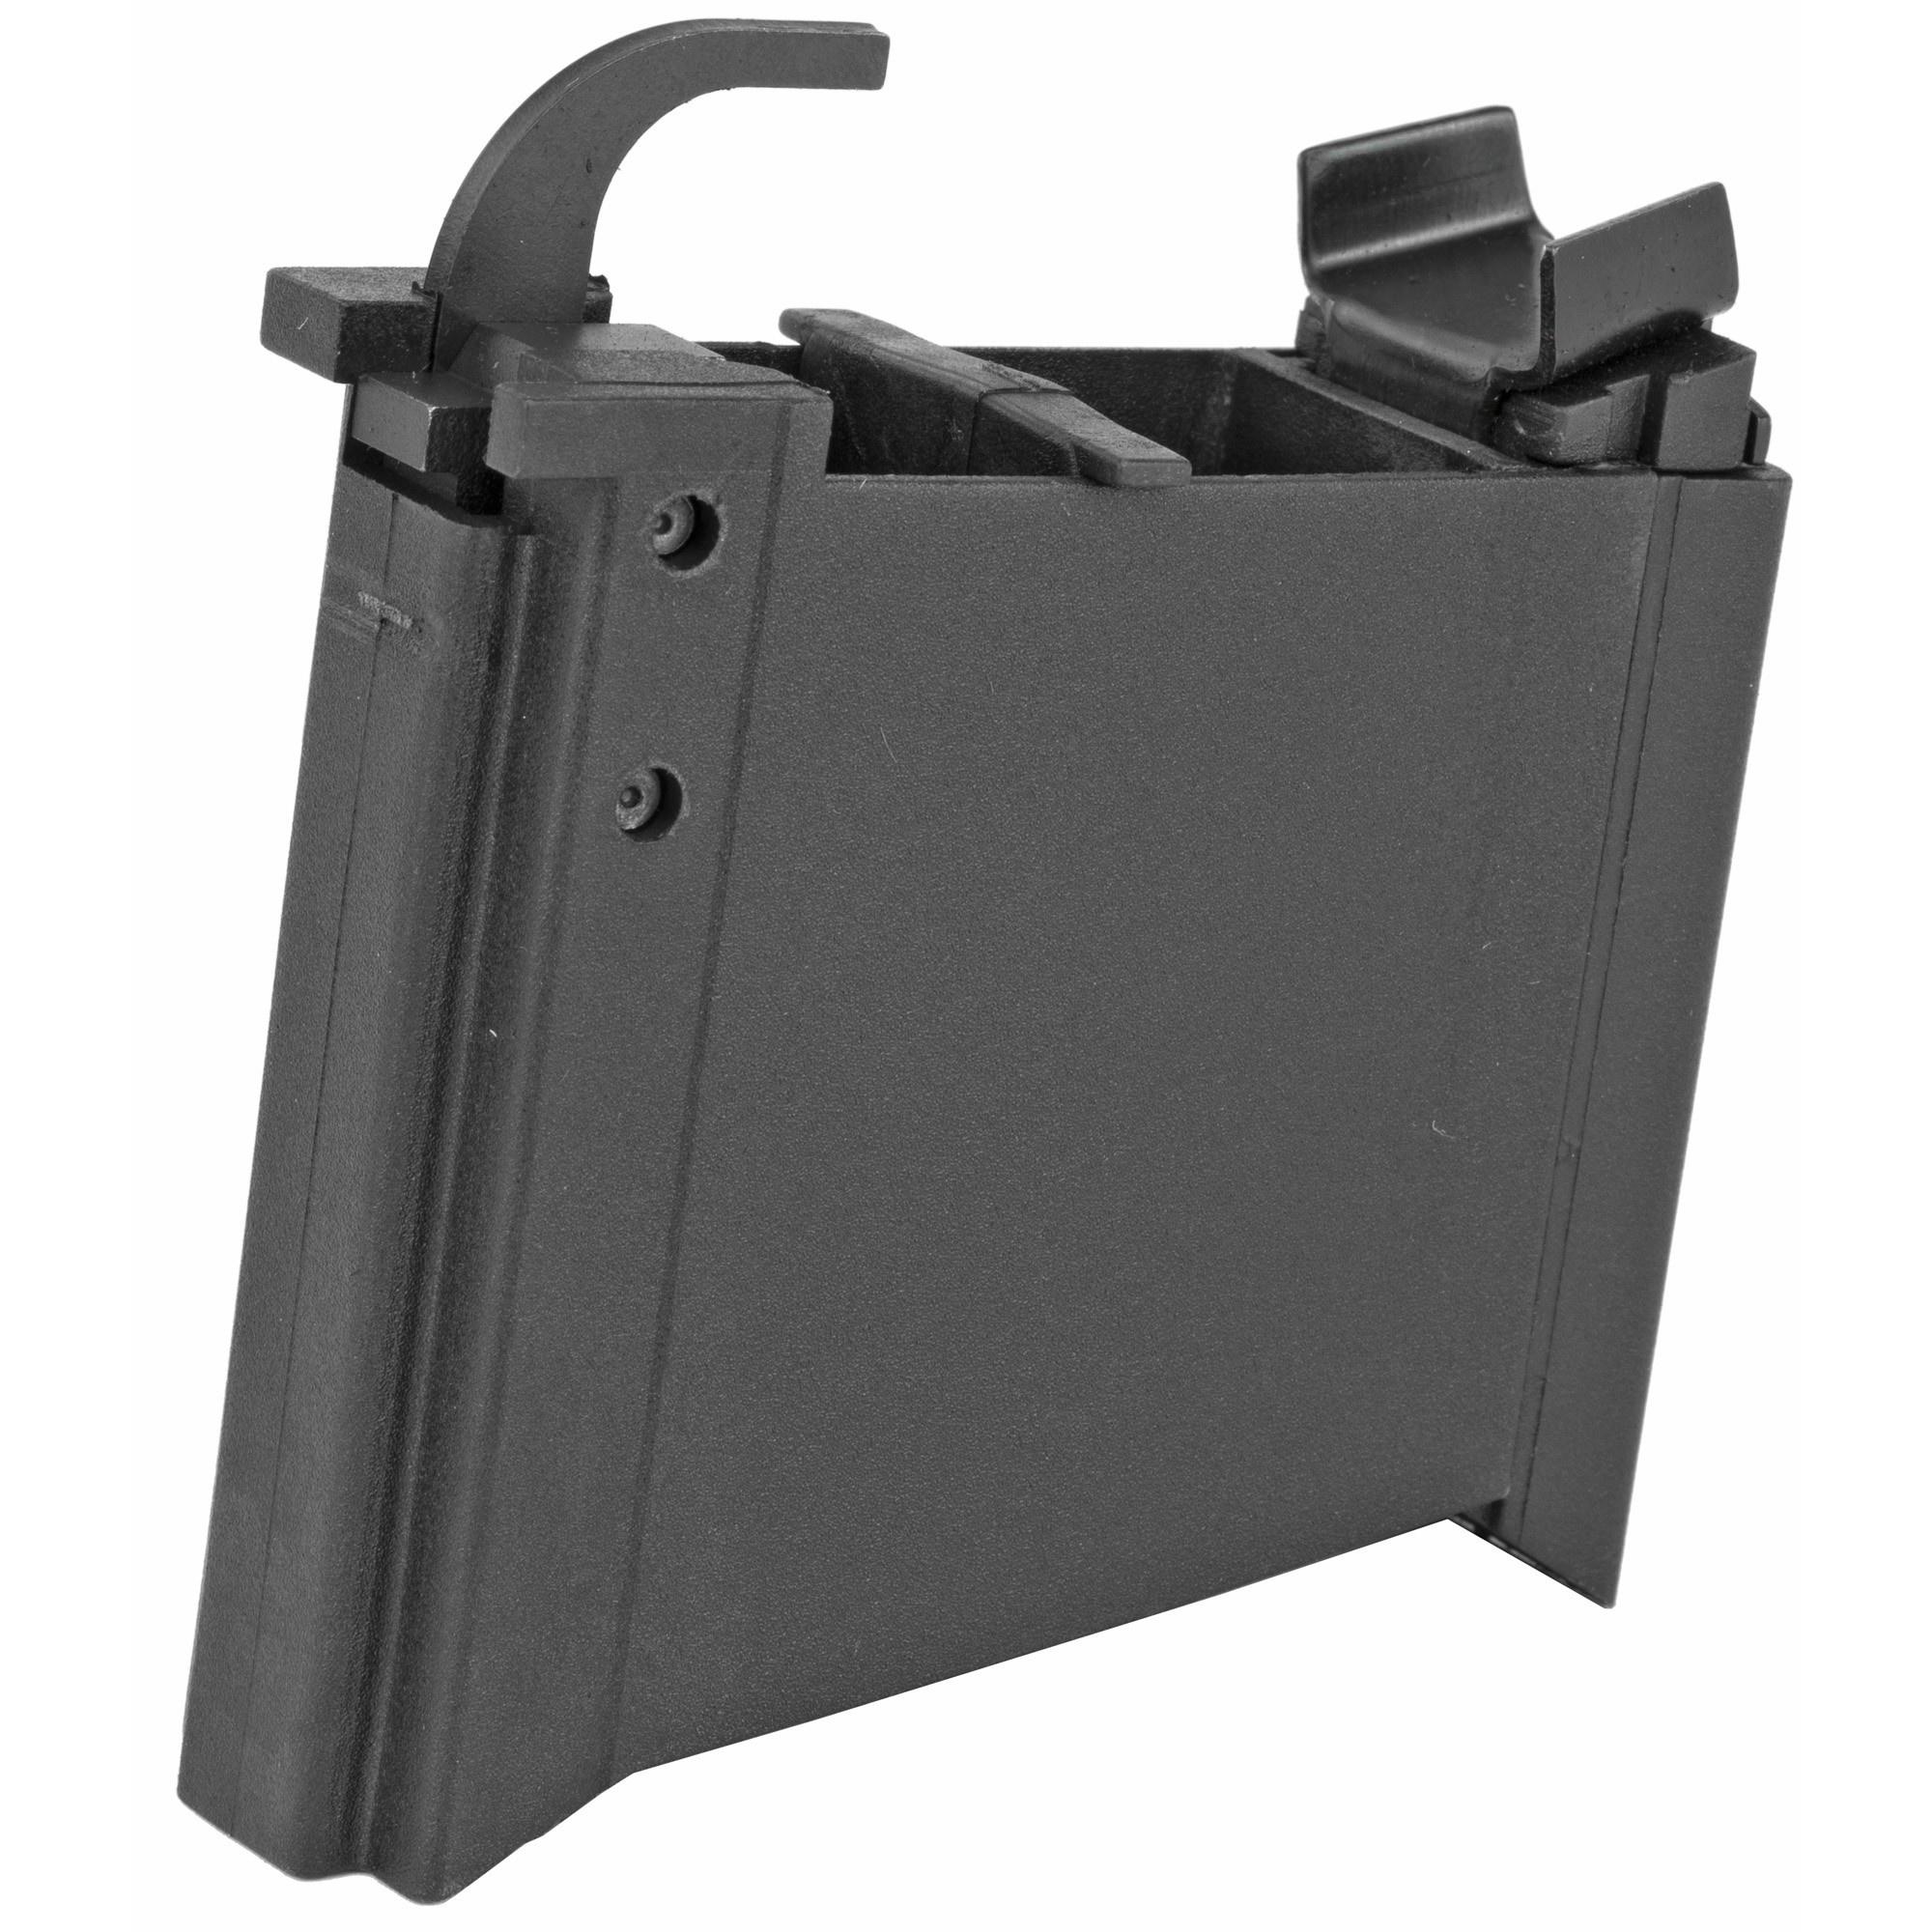 ProMag AR-15 9MM Magazine Quick Change Adapter Block Black Polymer